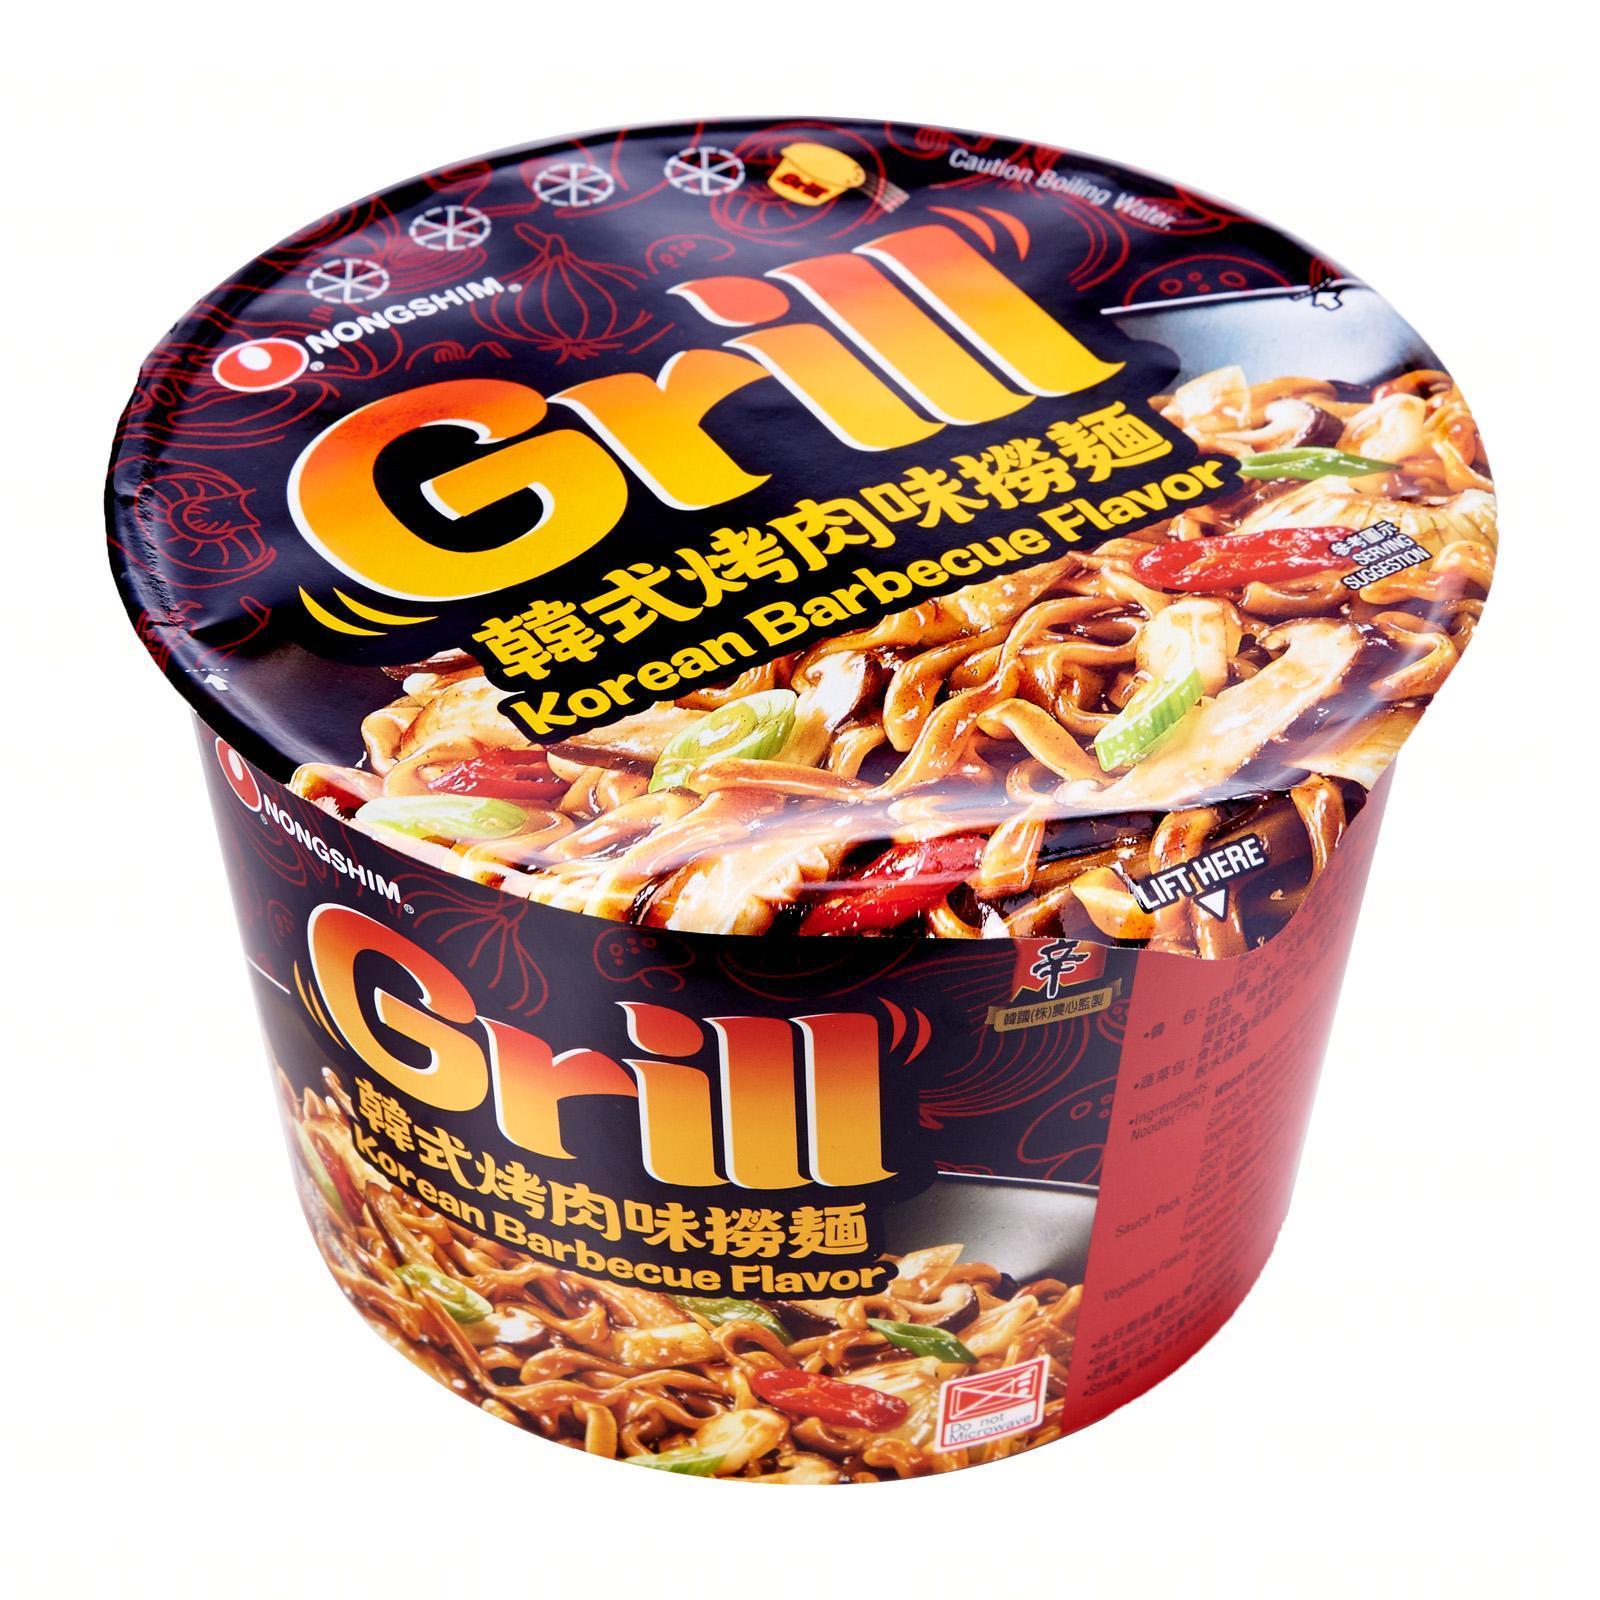 NONG SHIM Grill Fried Bowl Noodle - Korean BBQ 98g